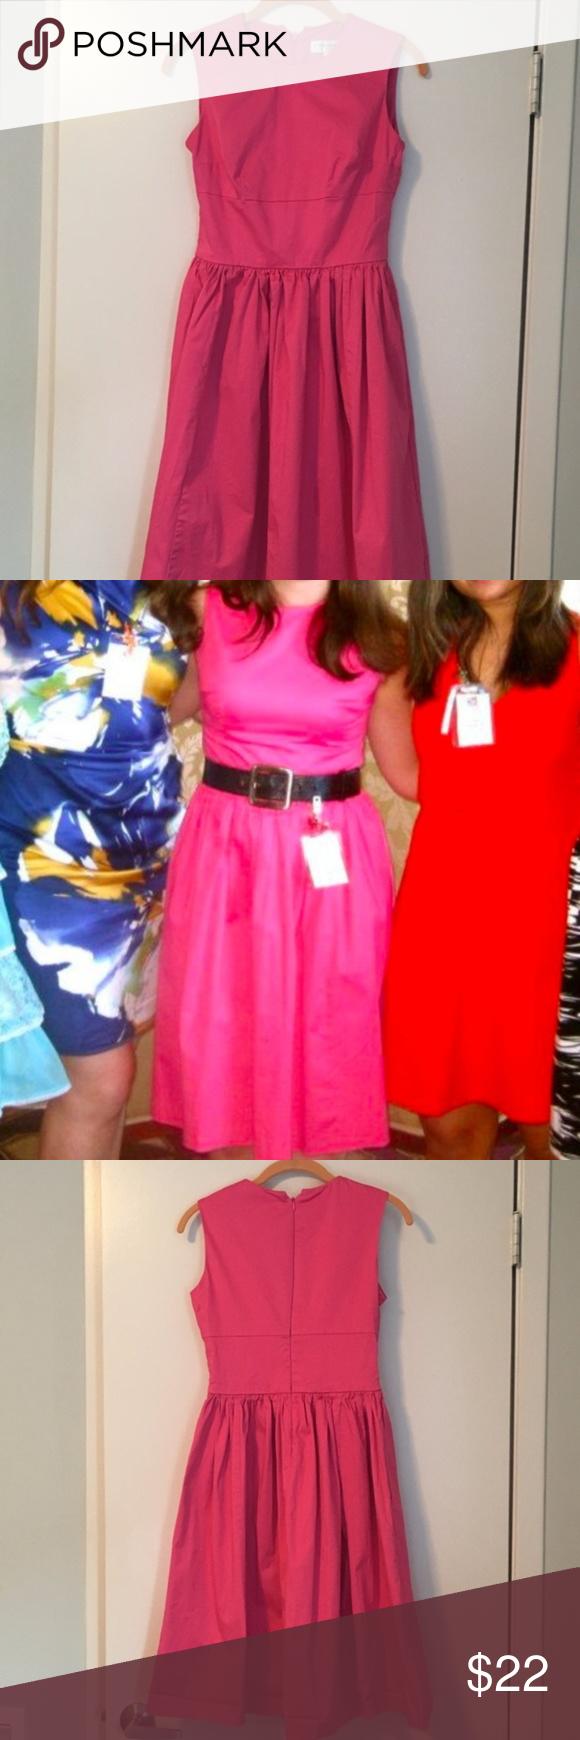 Classic Pink Party Dress Isaac Mizrahi For Target Great For Easter Gorgeous Pink Isaac Mizrahi For Target Dress Kn Pink Party Dresses Dresses Target Dress [ 1740 x 580 Pixel ]